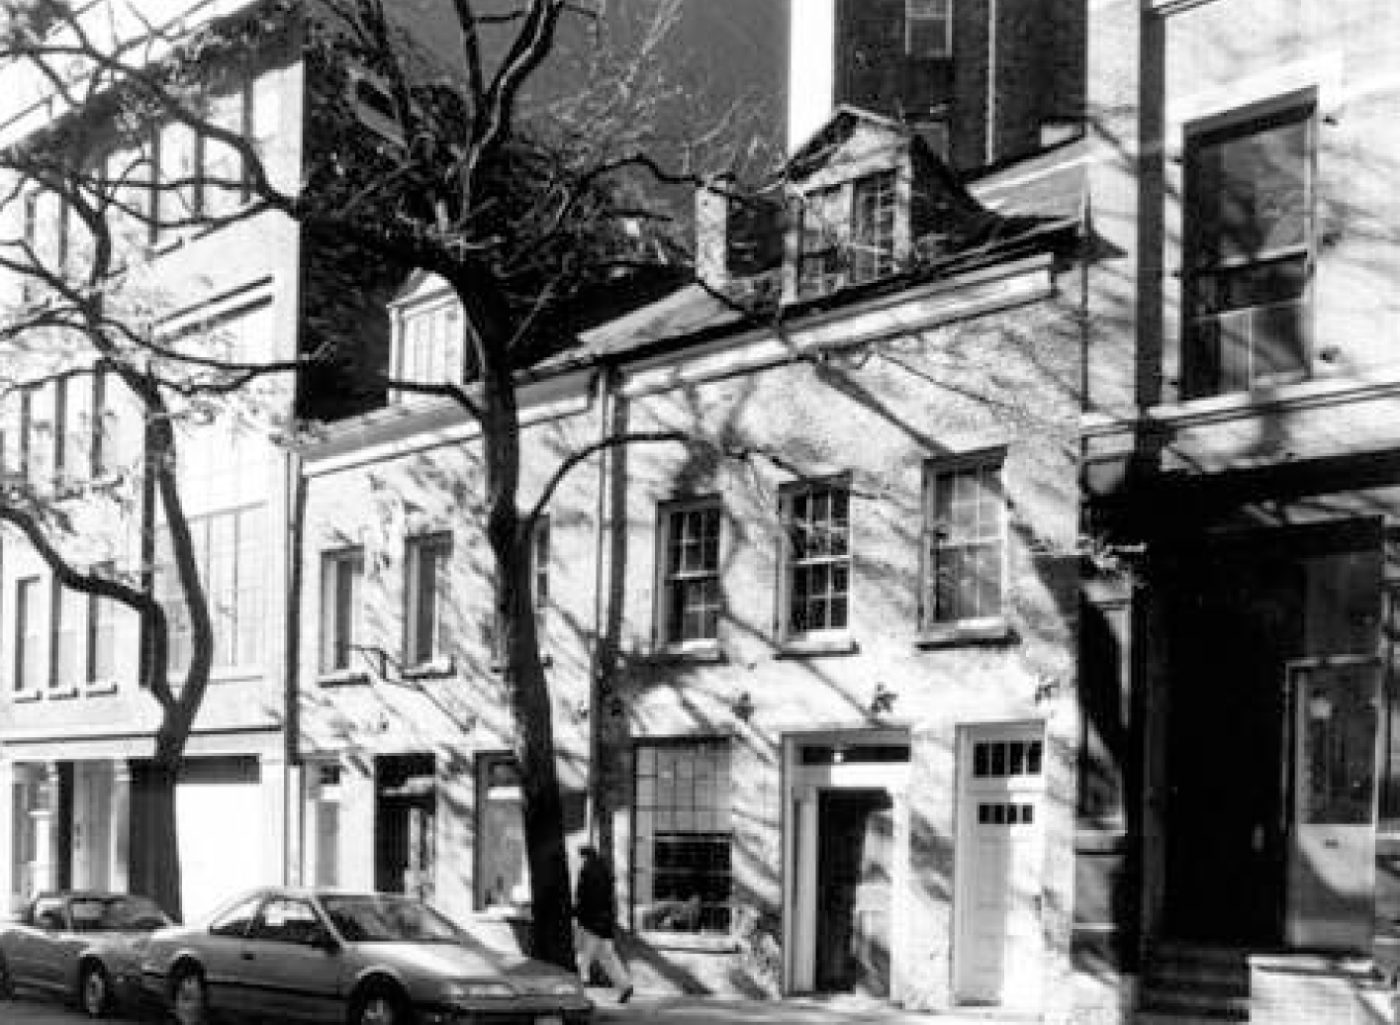 The Federal Era Row House